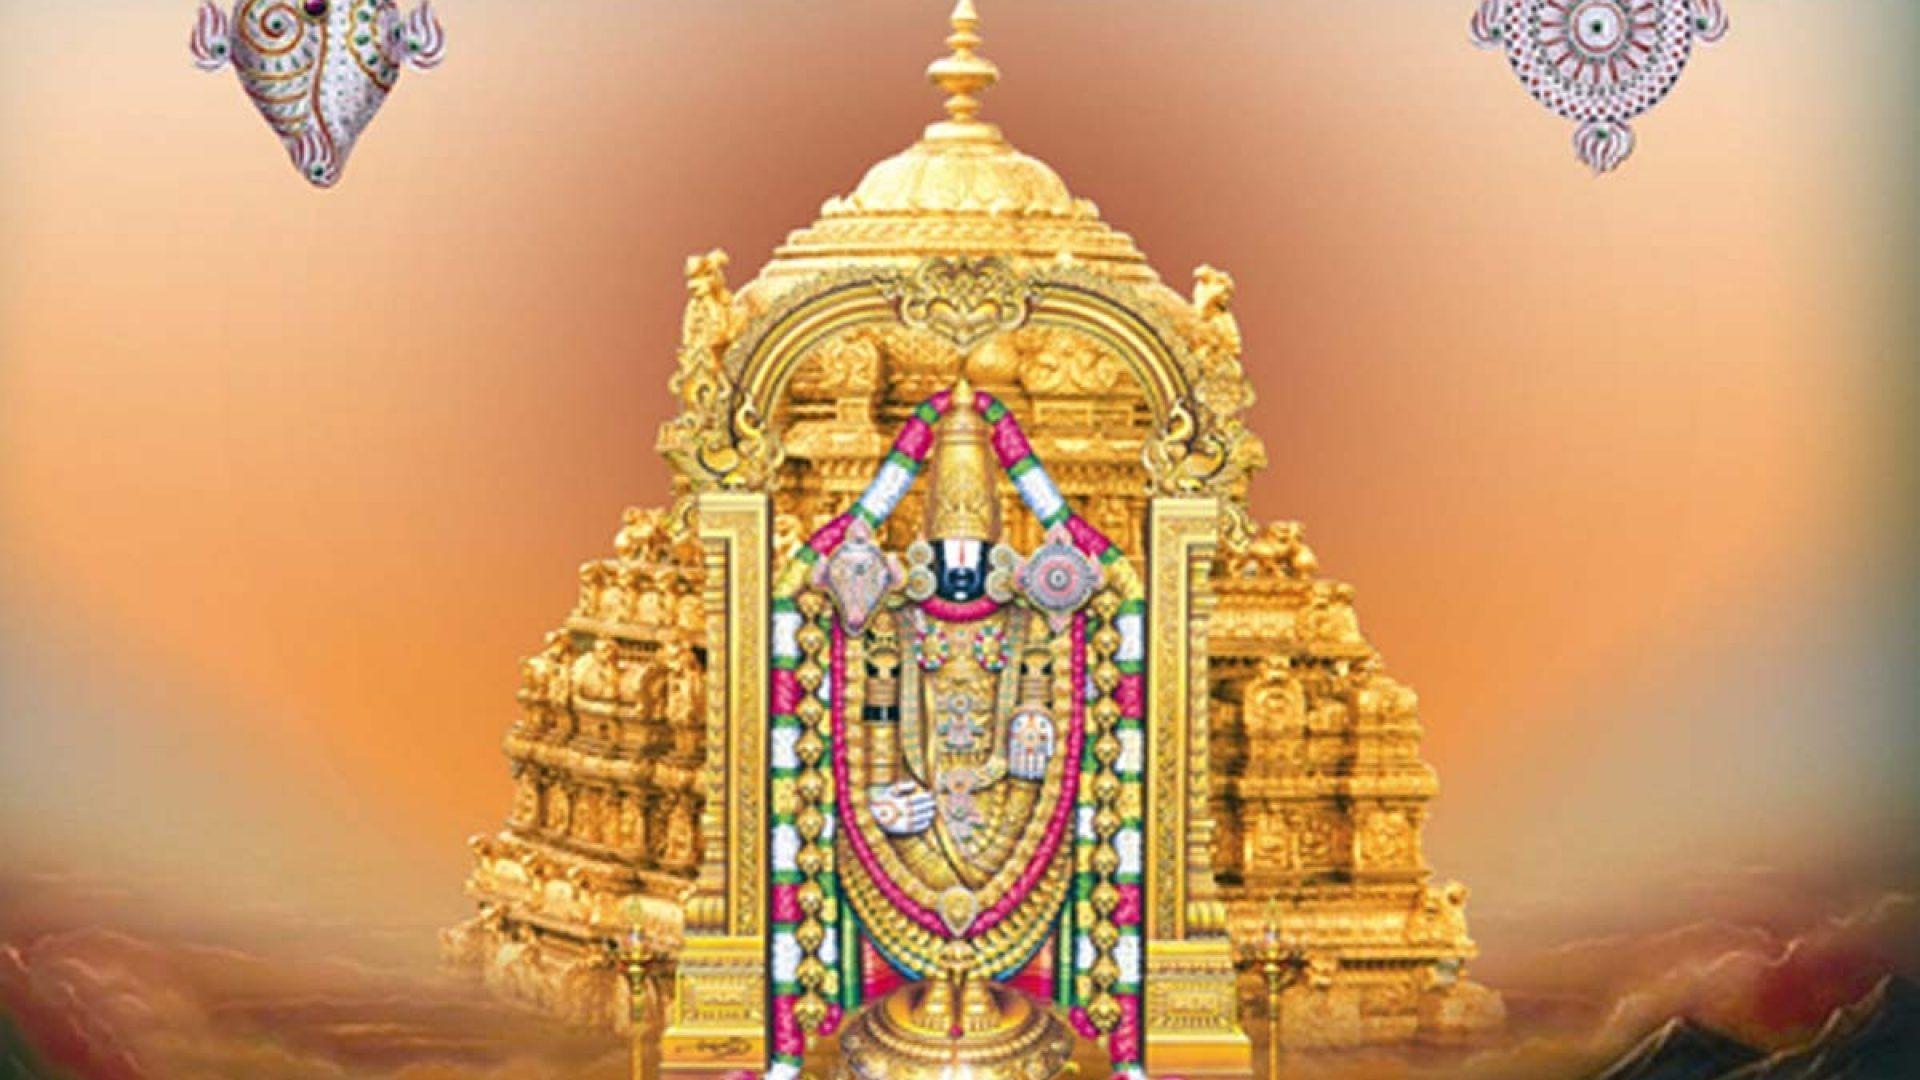 Fresh Lord Venkateswara Hd Wallpapers 1920 215 1080 Free Hd Wallpaper Wallpaper God Pictures